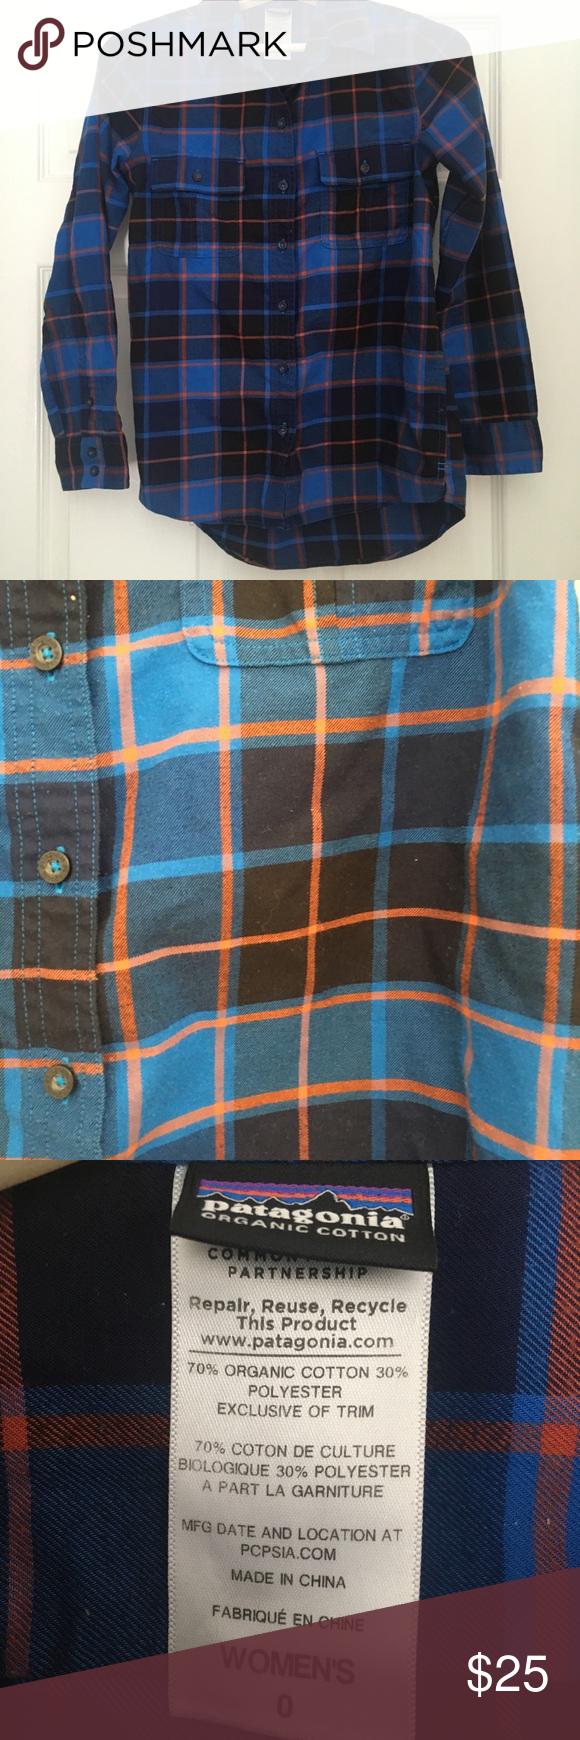 Orange flannel jacket  Patagonia womenus flannel shirt  Patagonia Flannel shirts and Flannels